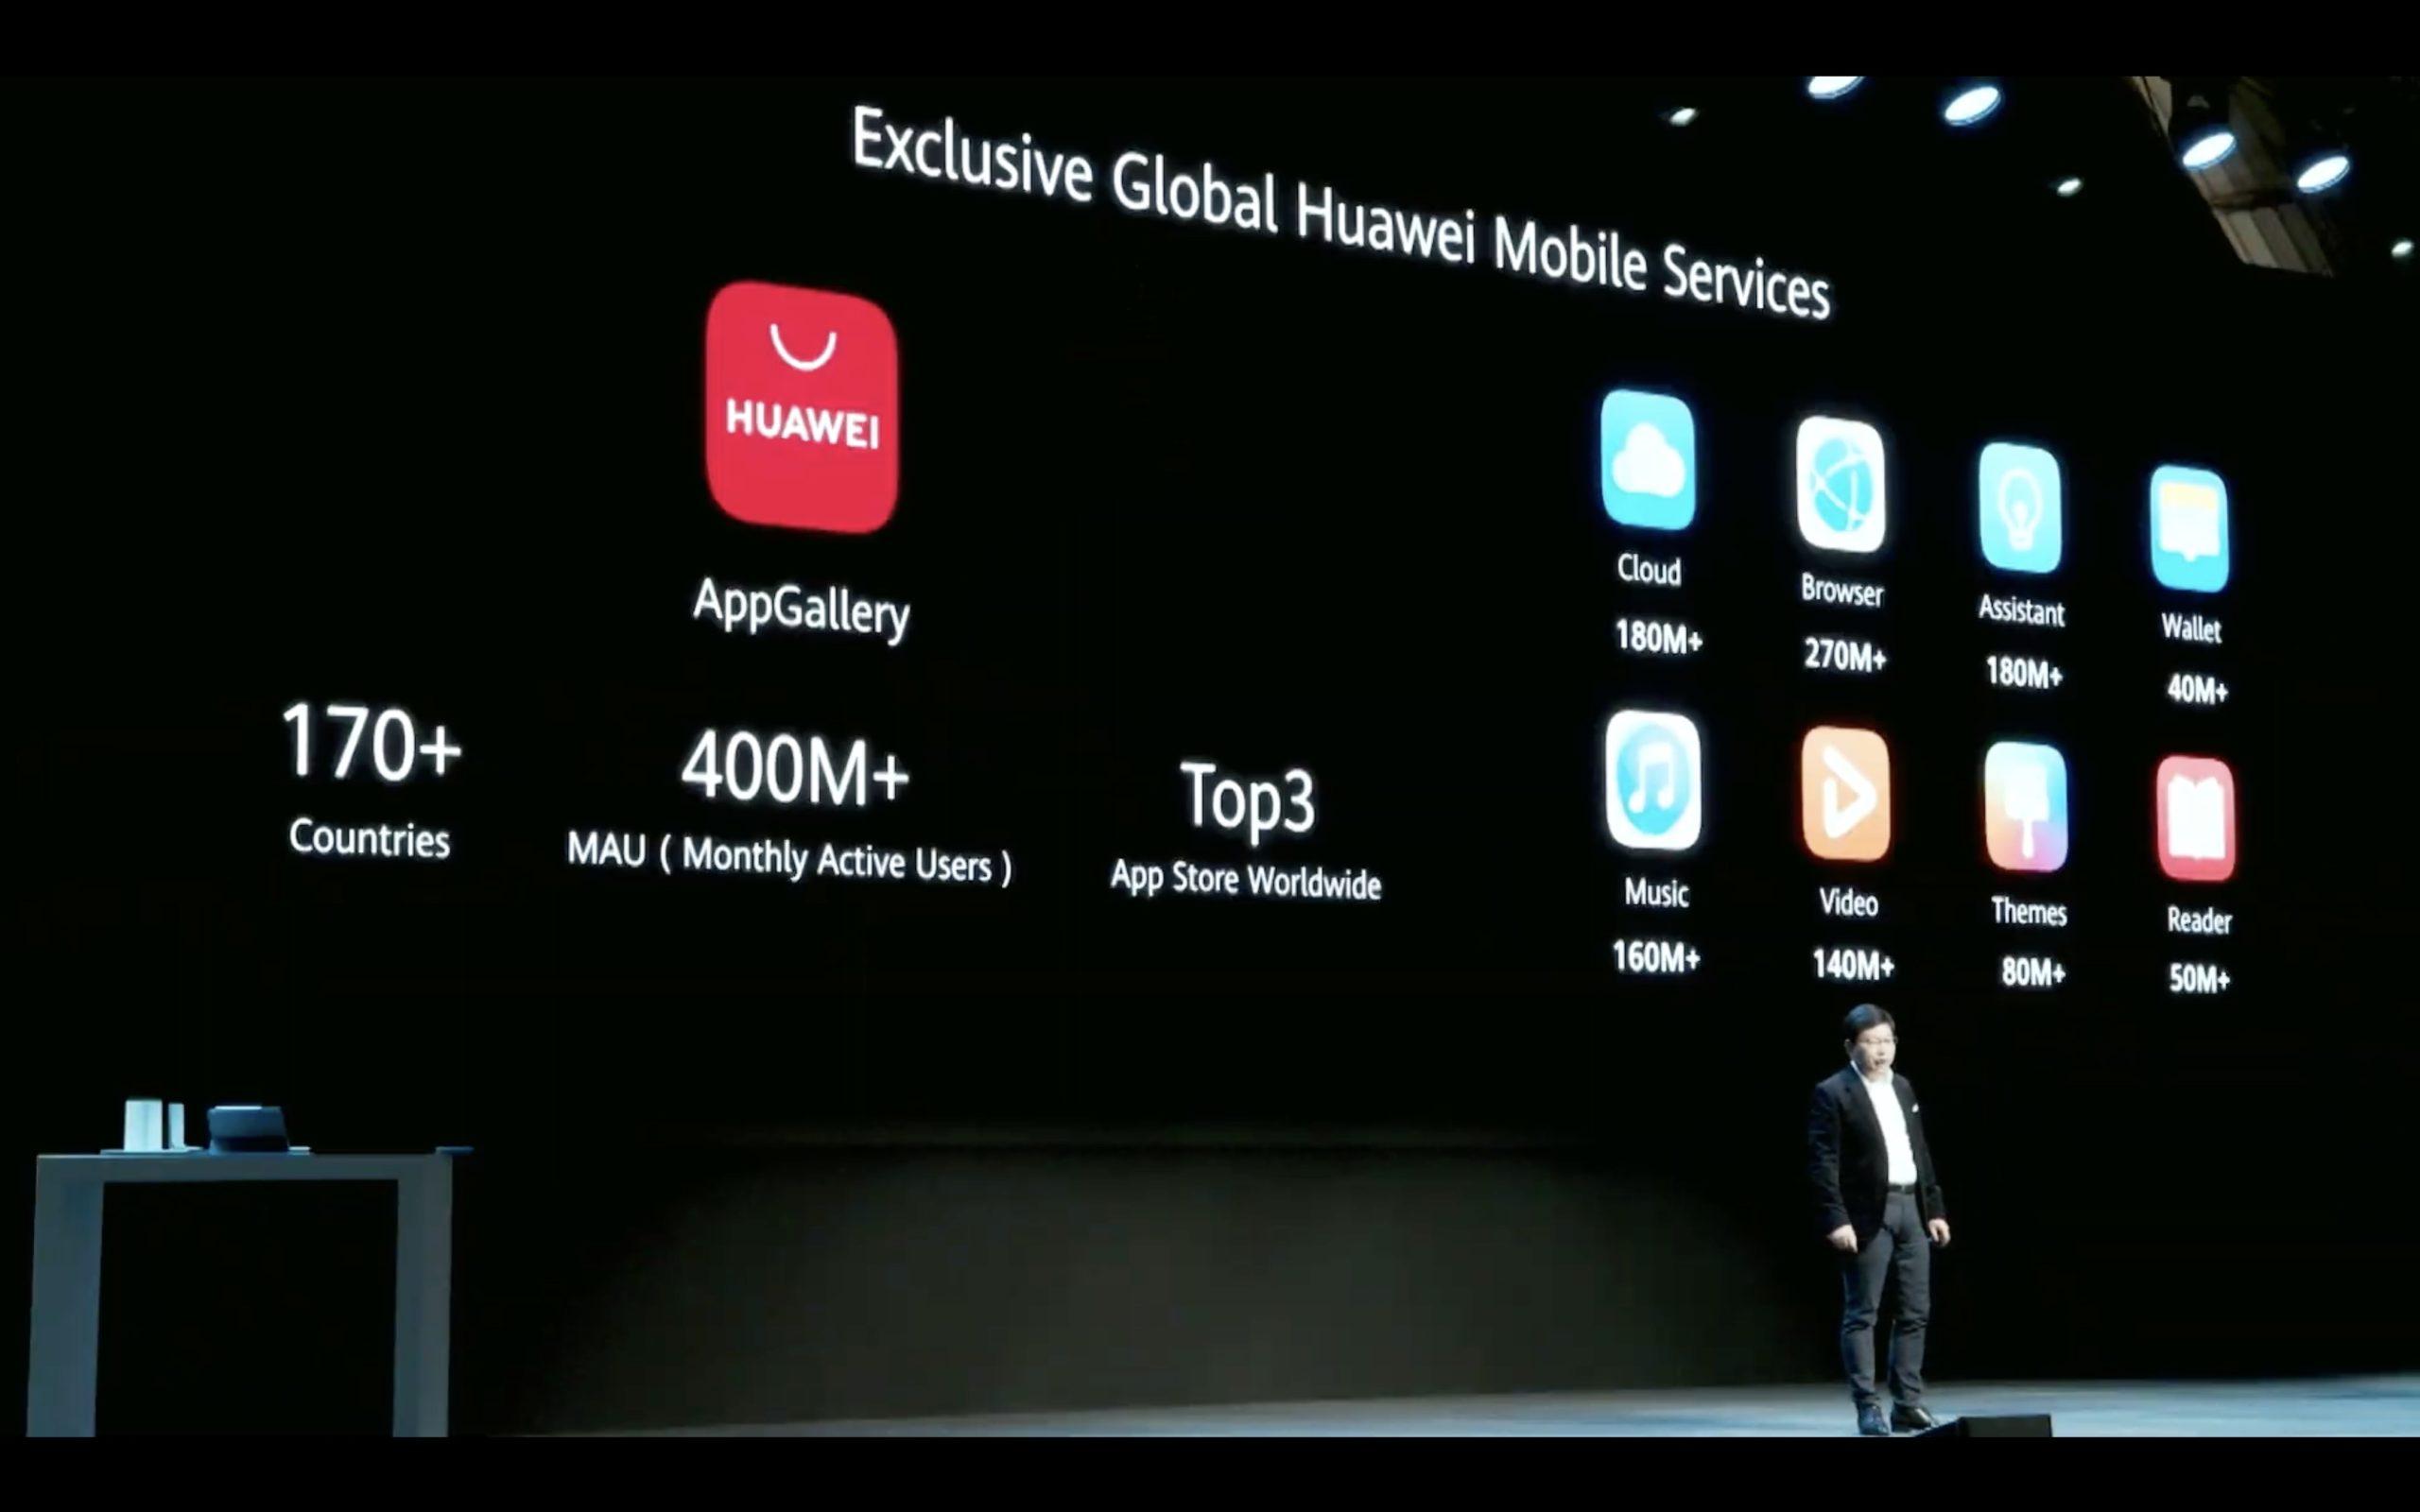 Huawei appgallery — альтернатива google play store